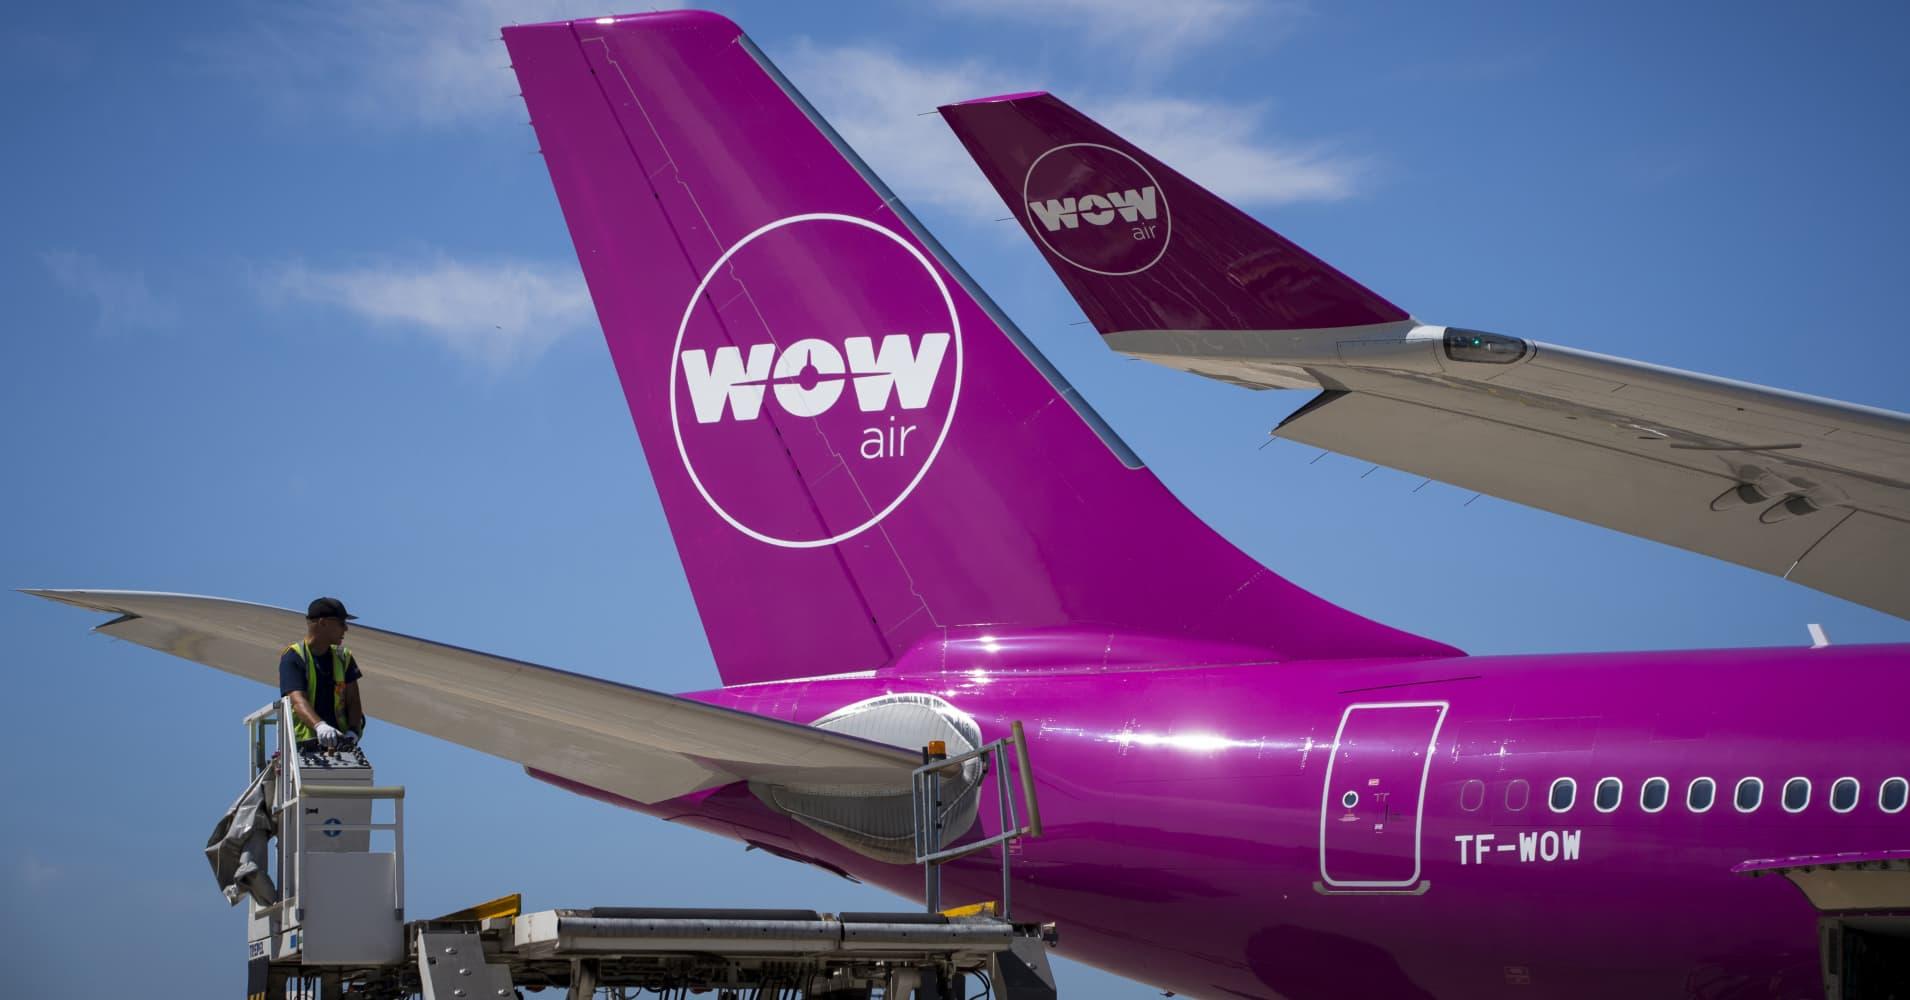 Icelandair buys WOW to strengthen international presence